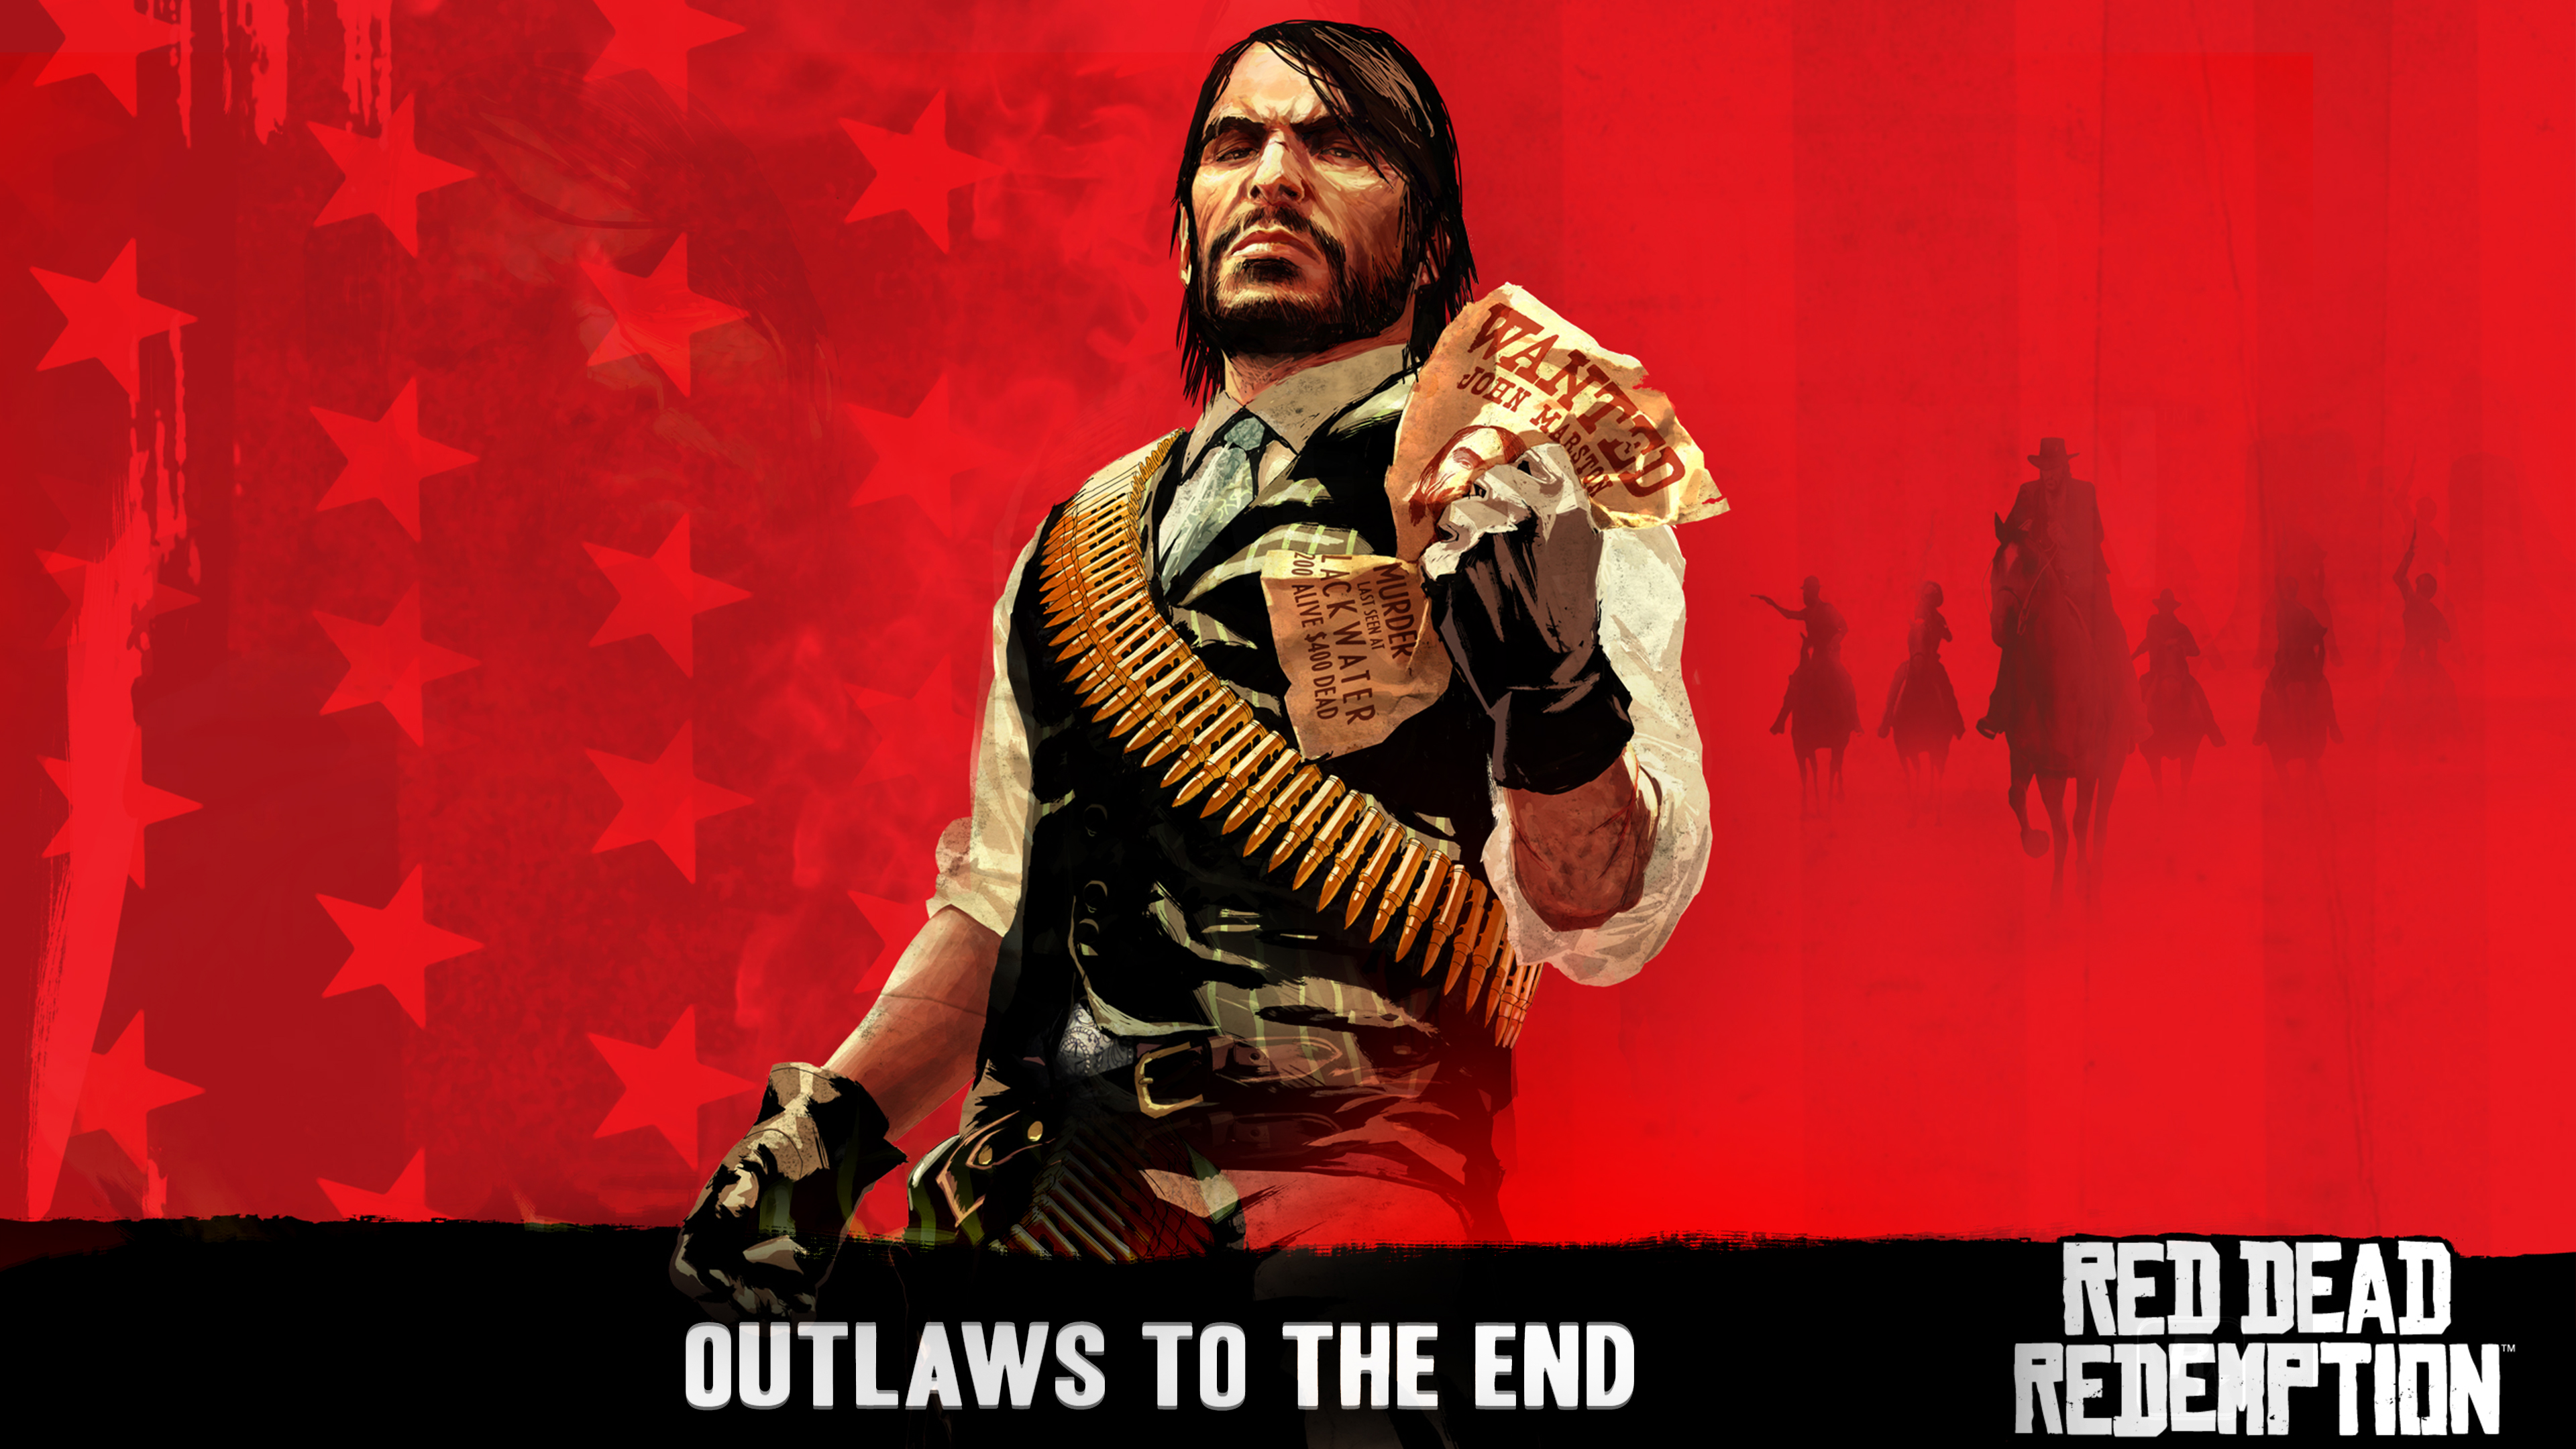 Red Dead Redemption Marston Wanted Desktop Background